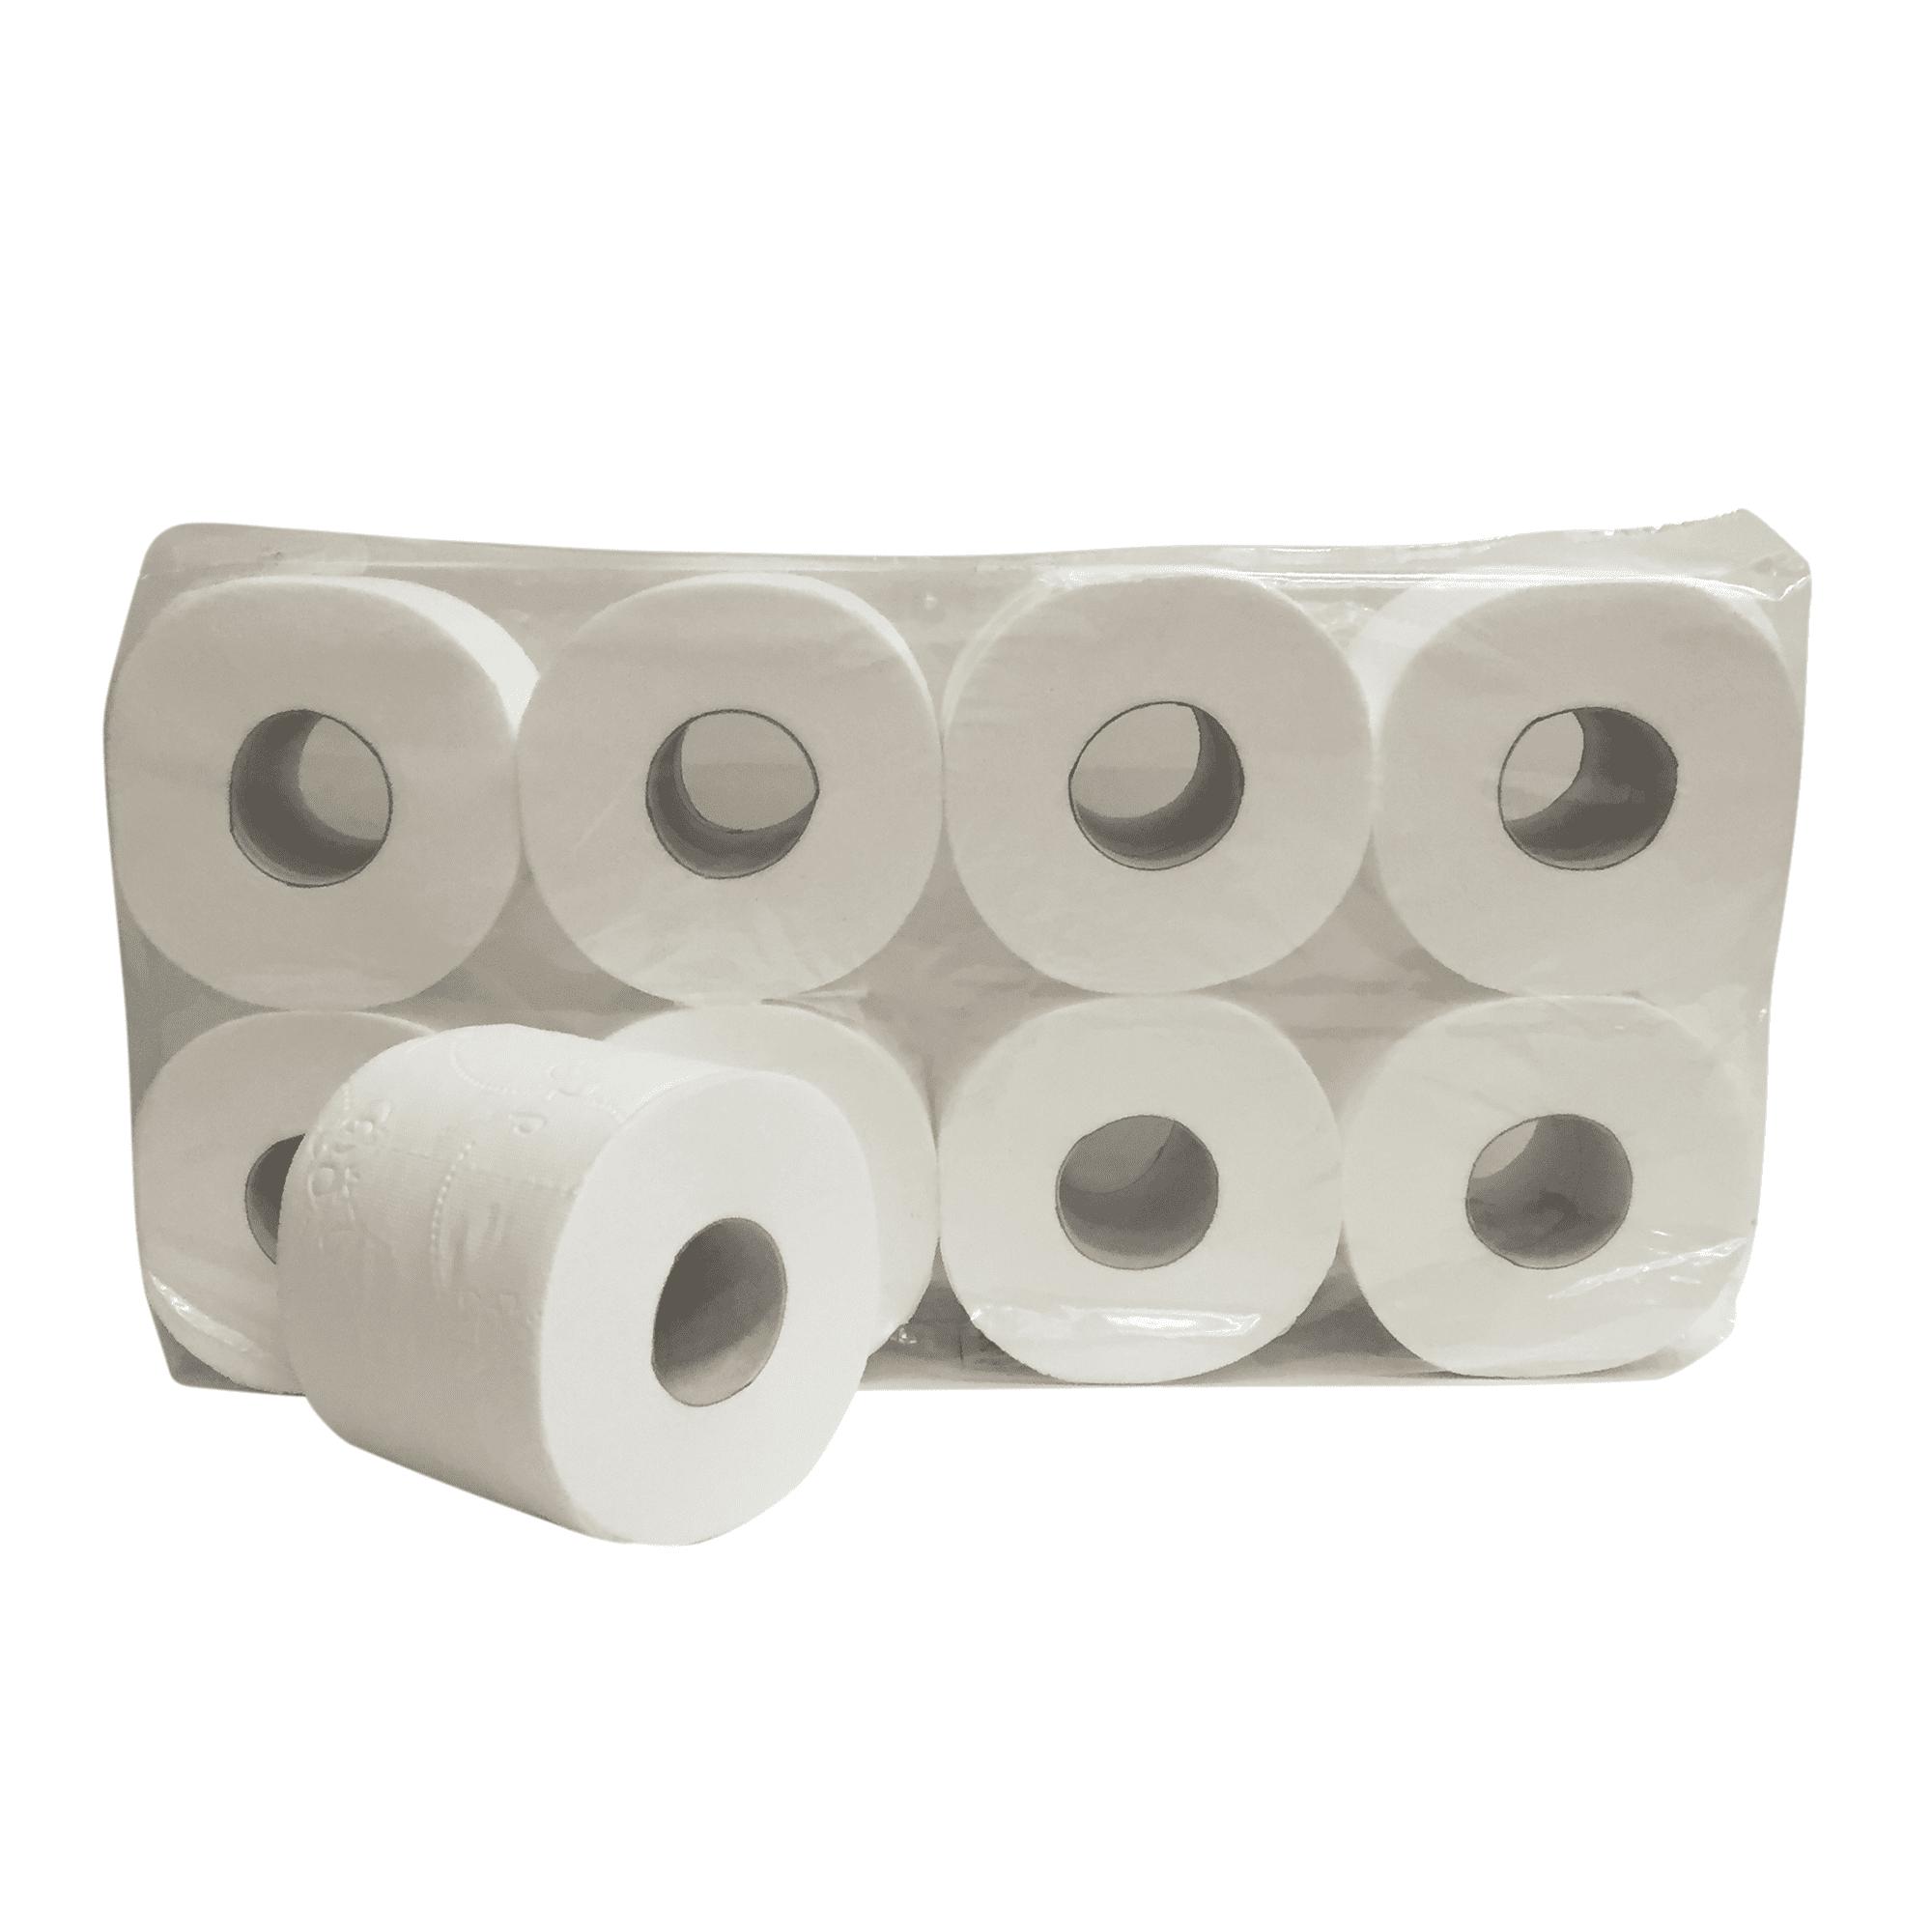 Toiletpapier cellulose 3-laags - 250 vel (64 rollen)